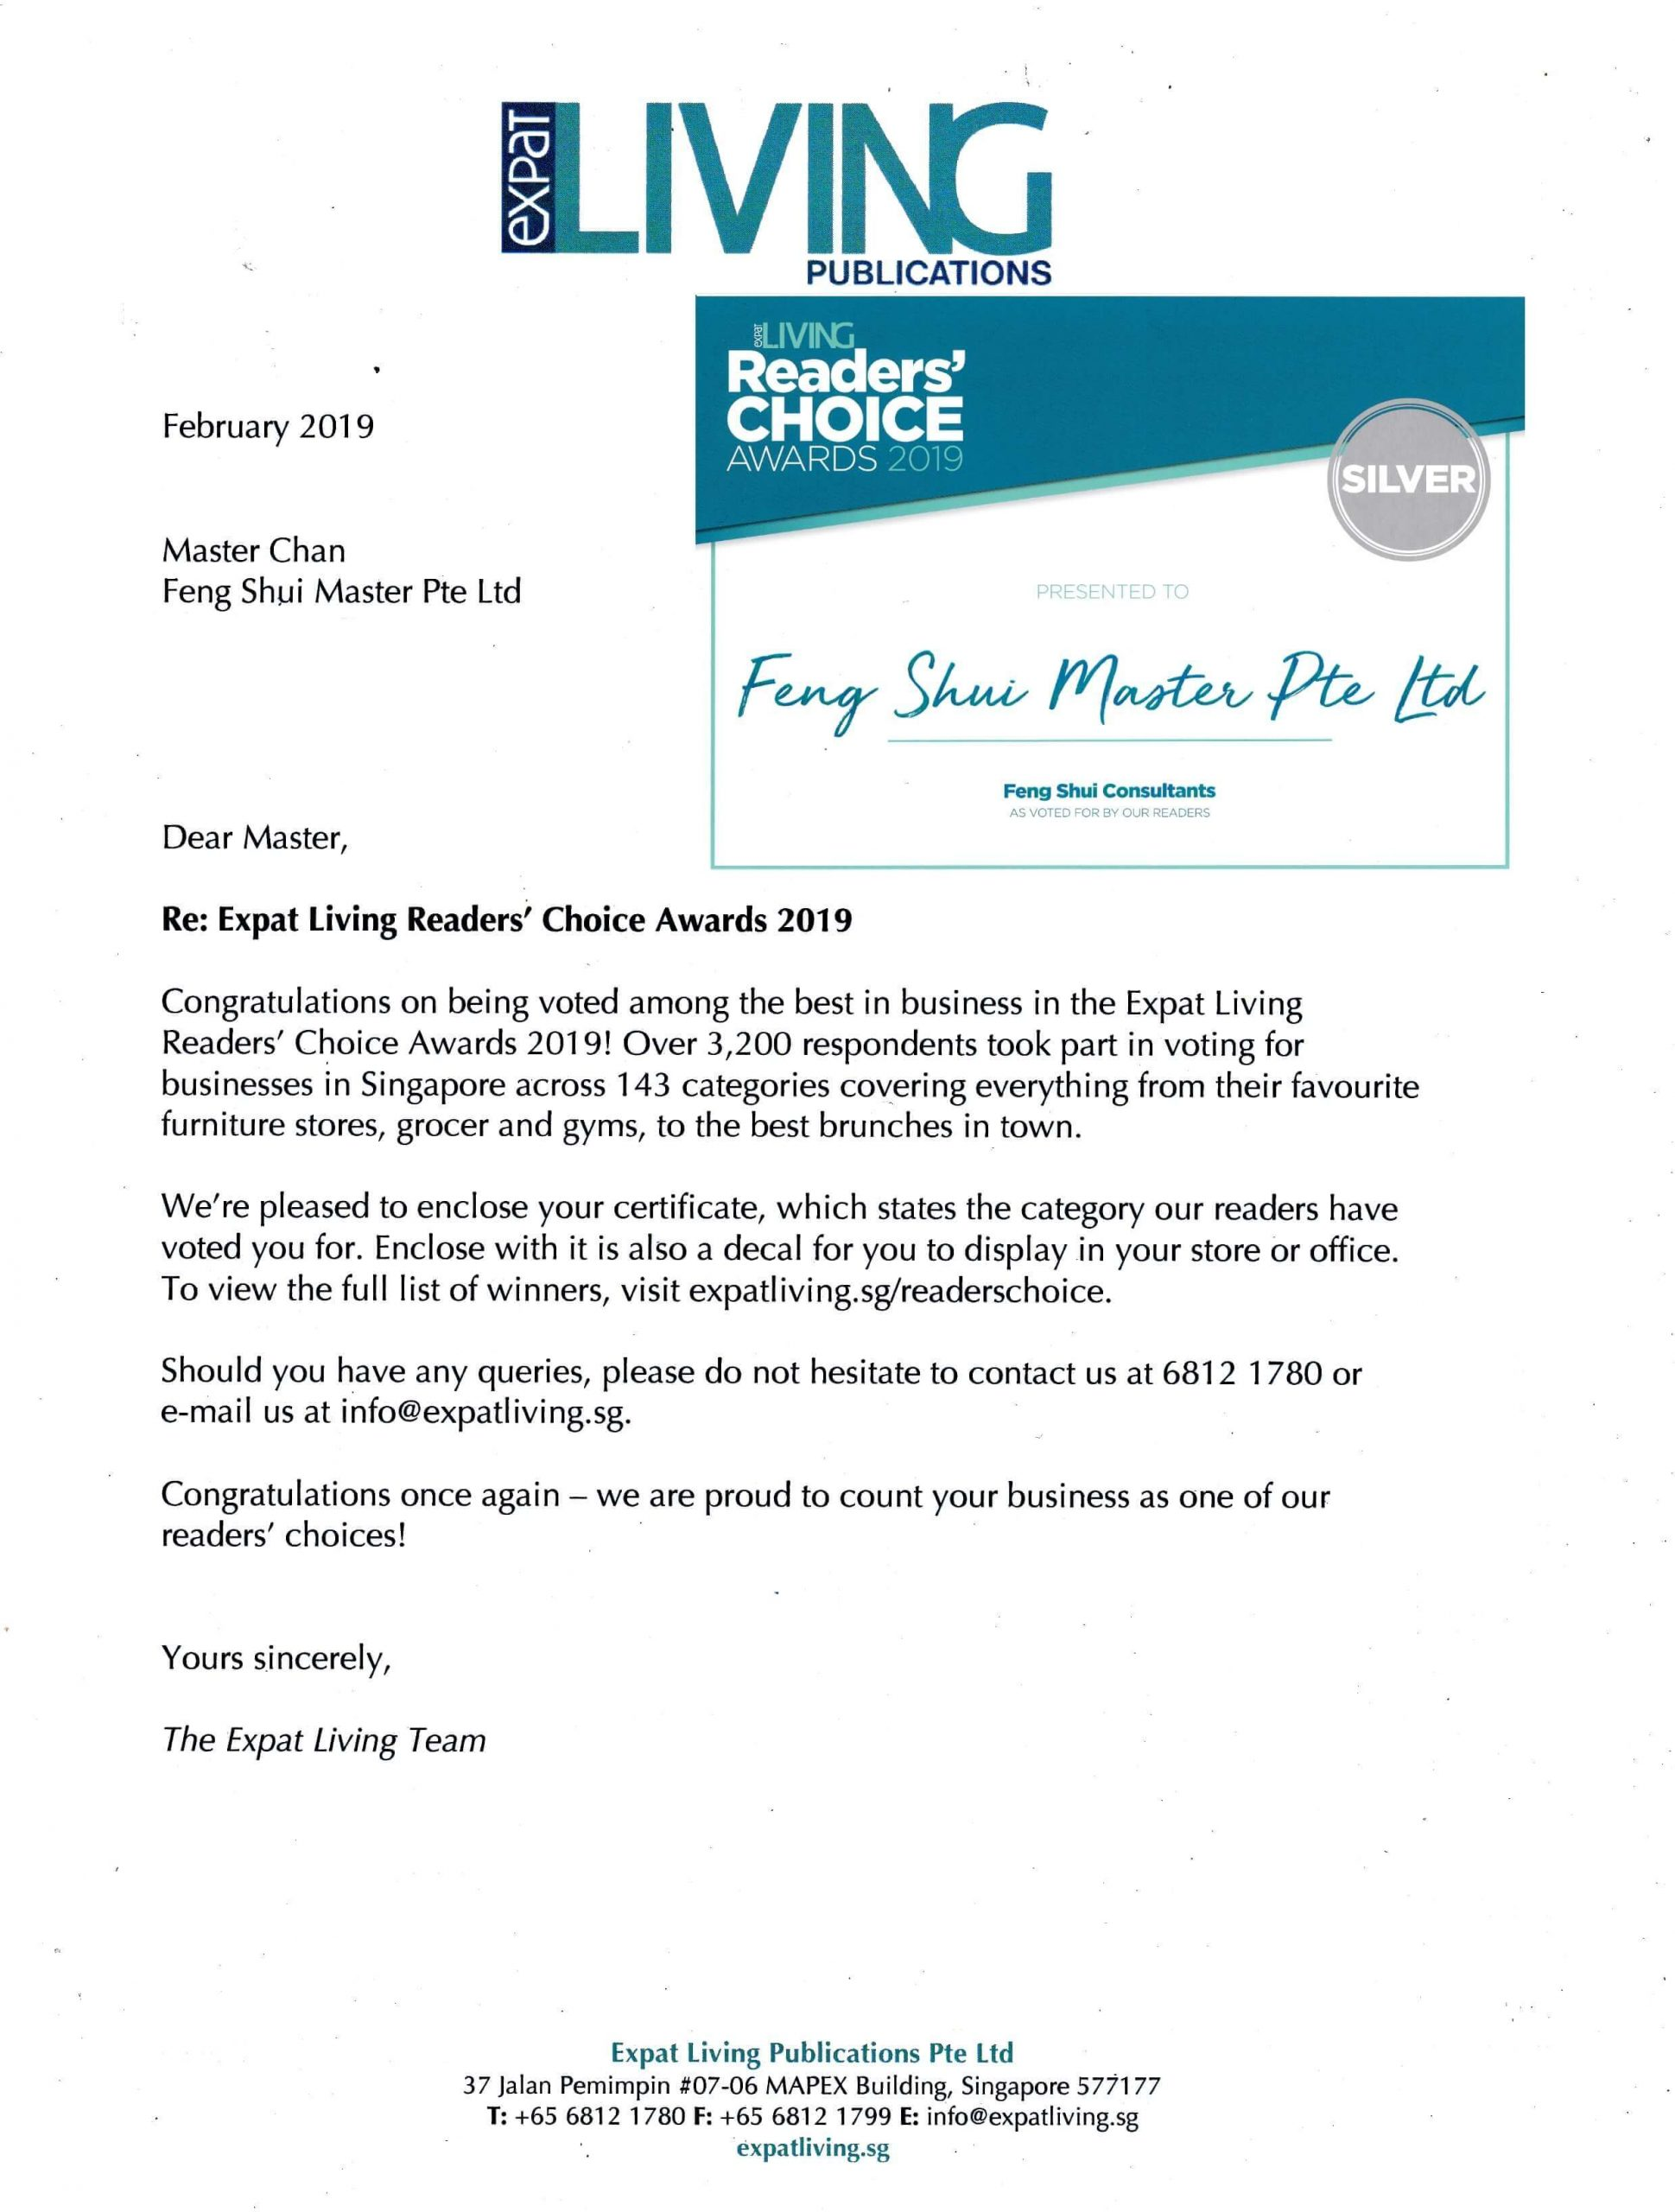 feng shui master expat living award